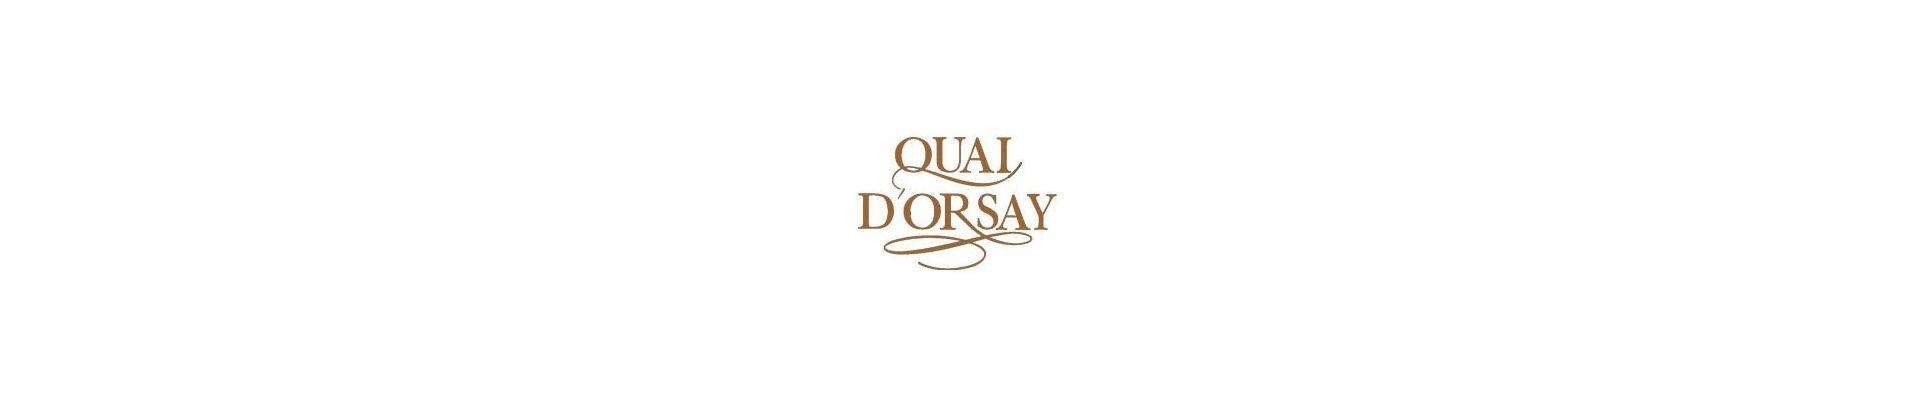 Trabucuri Quai D Orsay trabucuri cubaneze.Pret trabucuri cubaneze